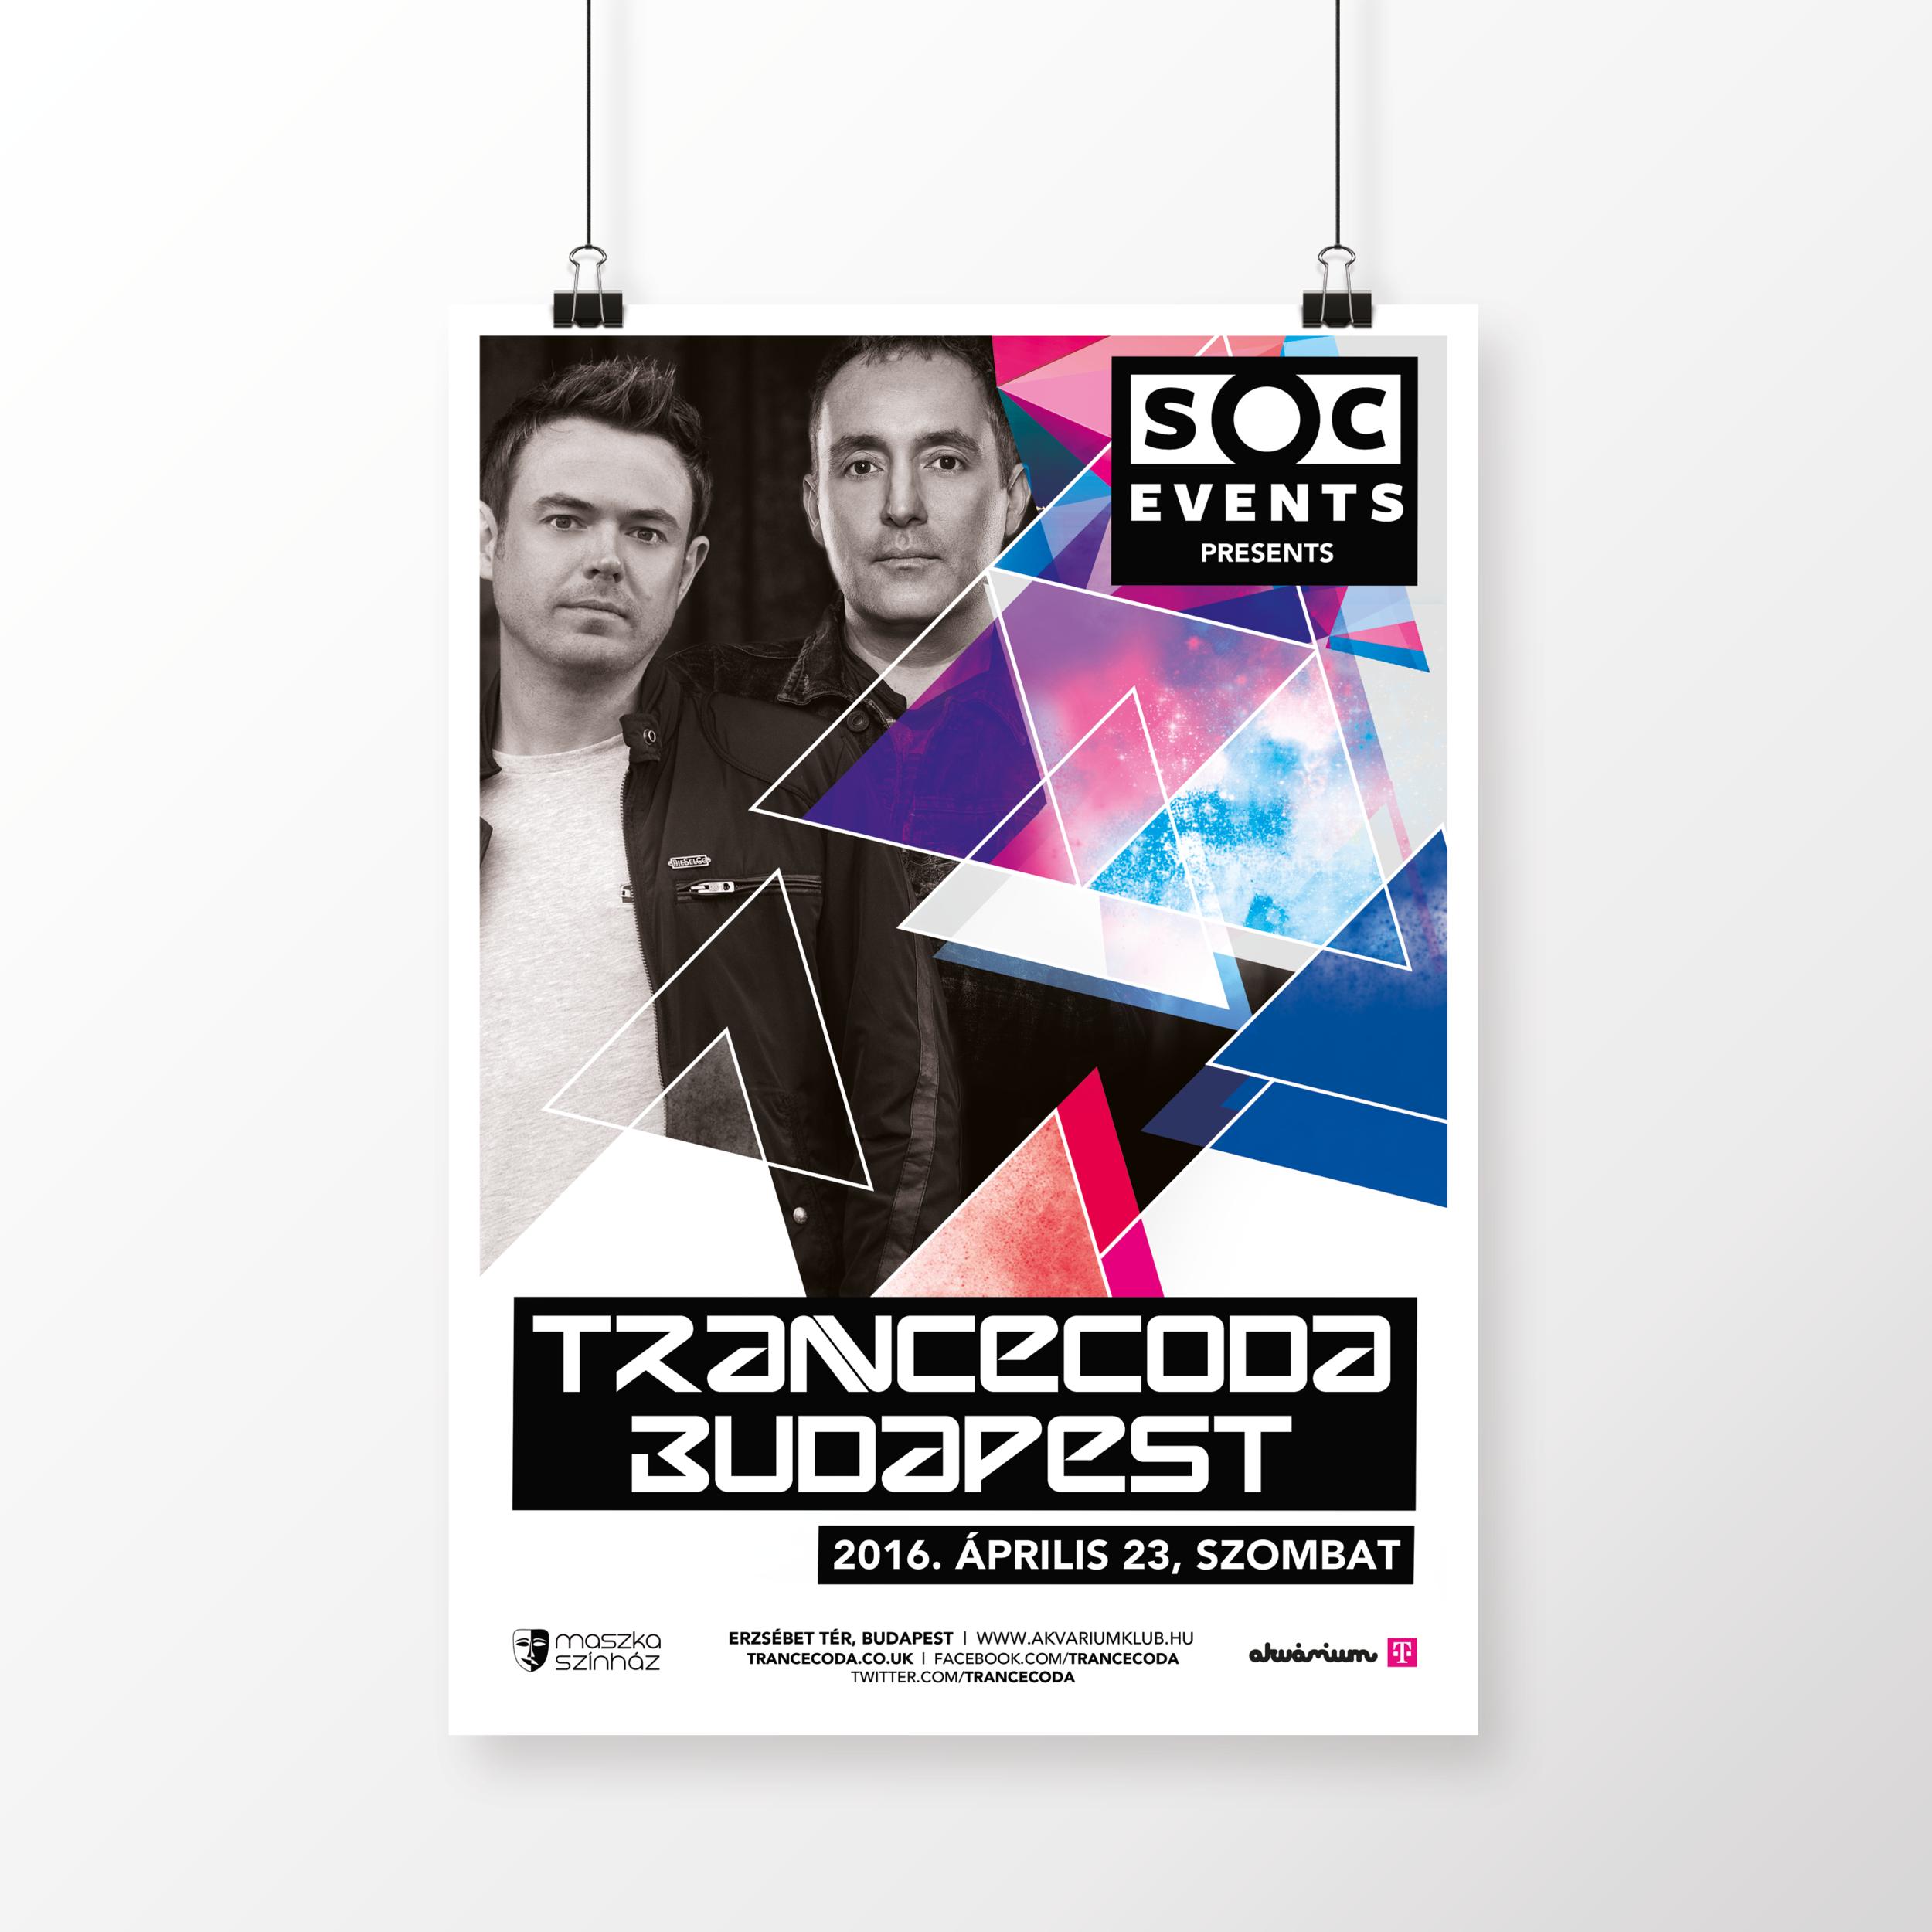 KuiperDesign-PosterDesign8